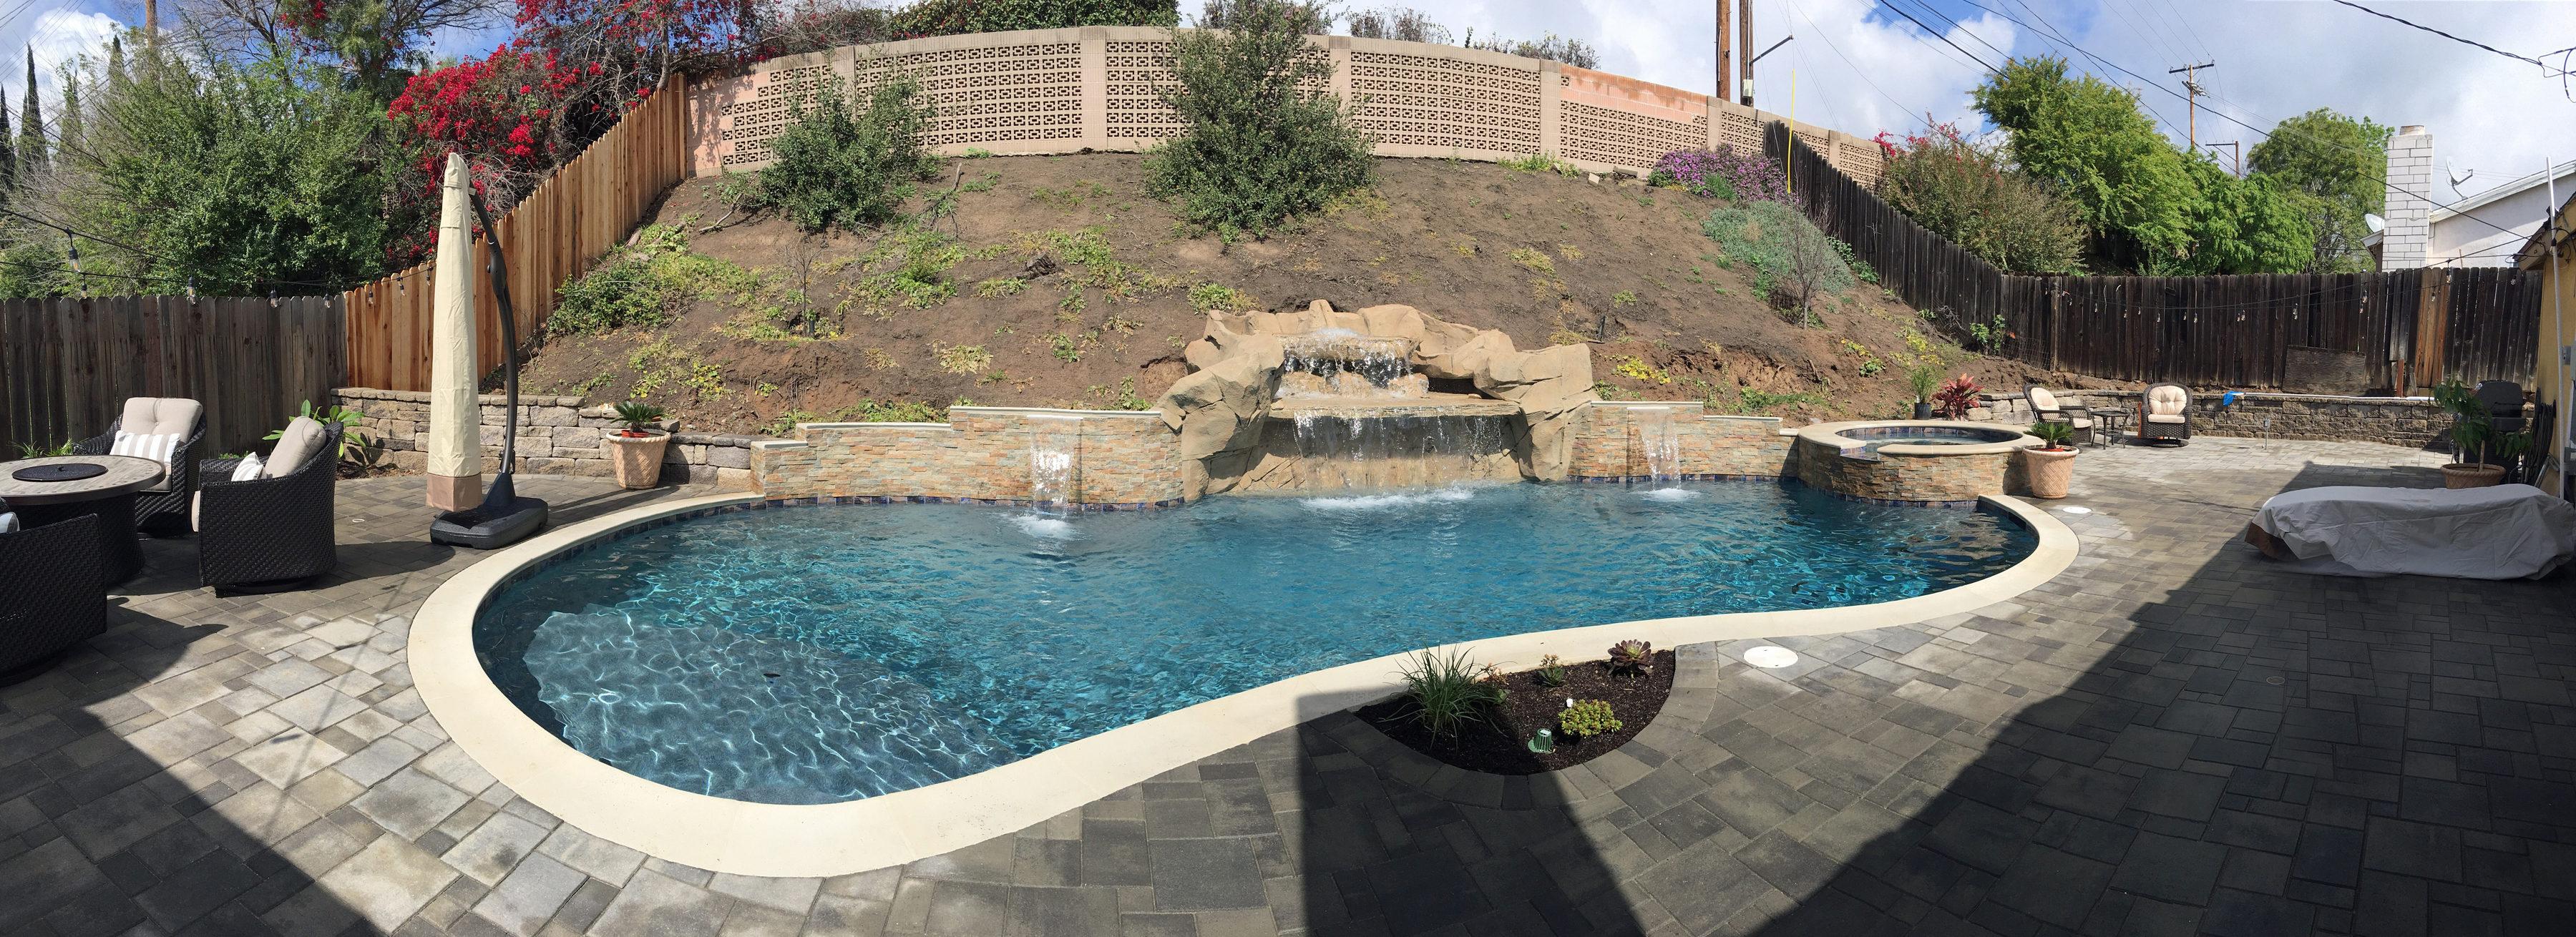 north georgia build a pool patio in